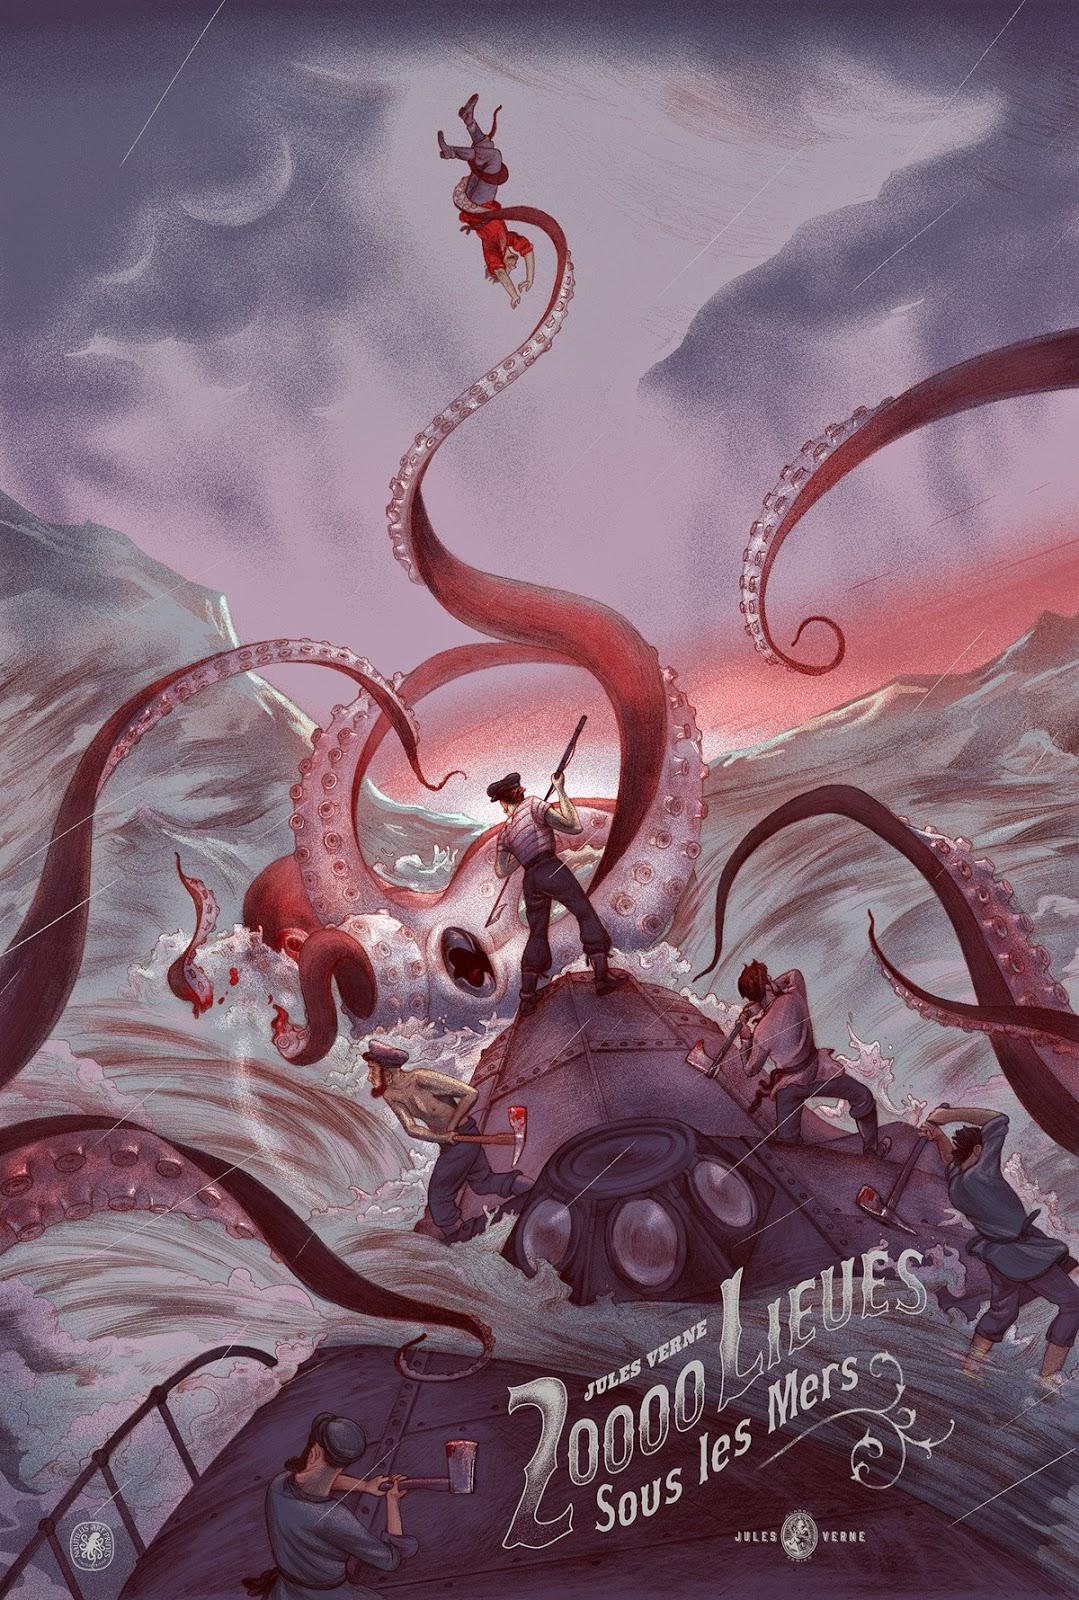 Nautilus Art Prints To Release 20 000 Leagues Under The